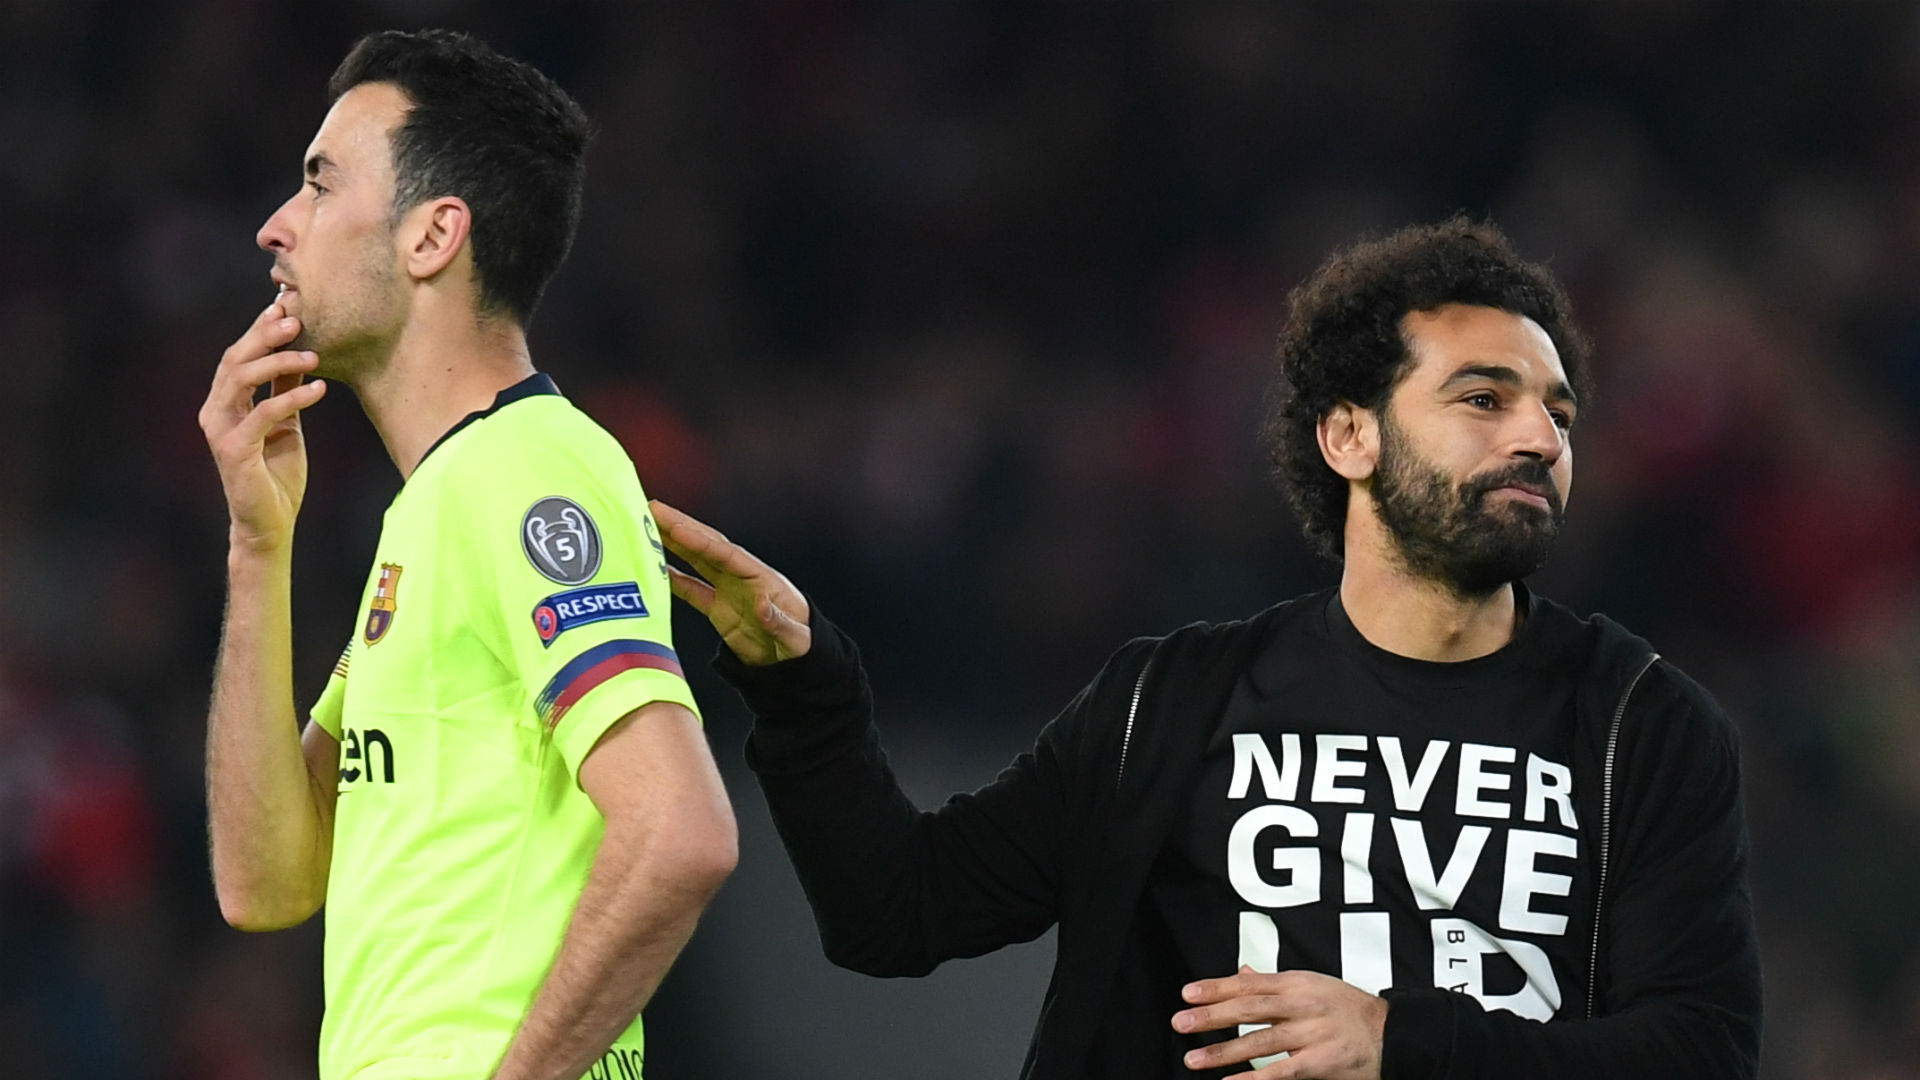 Mohamed Salah Sergio Busquets Barcelona Liverpool Champions League 2019